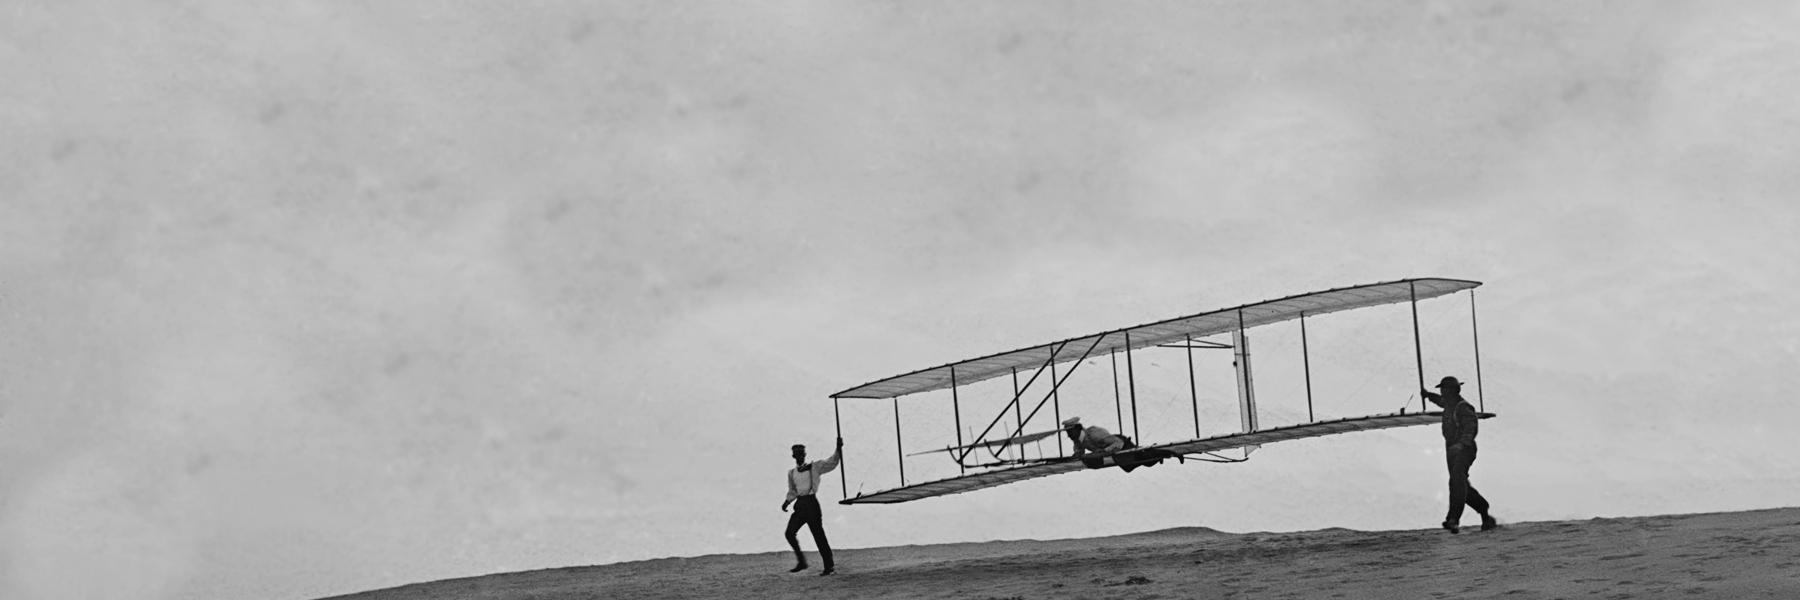 Wright glider 2 verplaatst